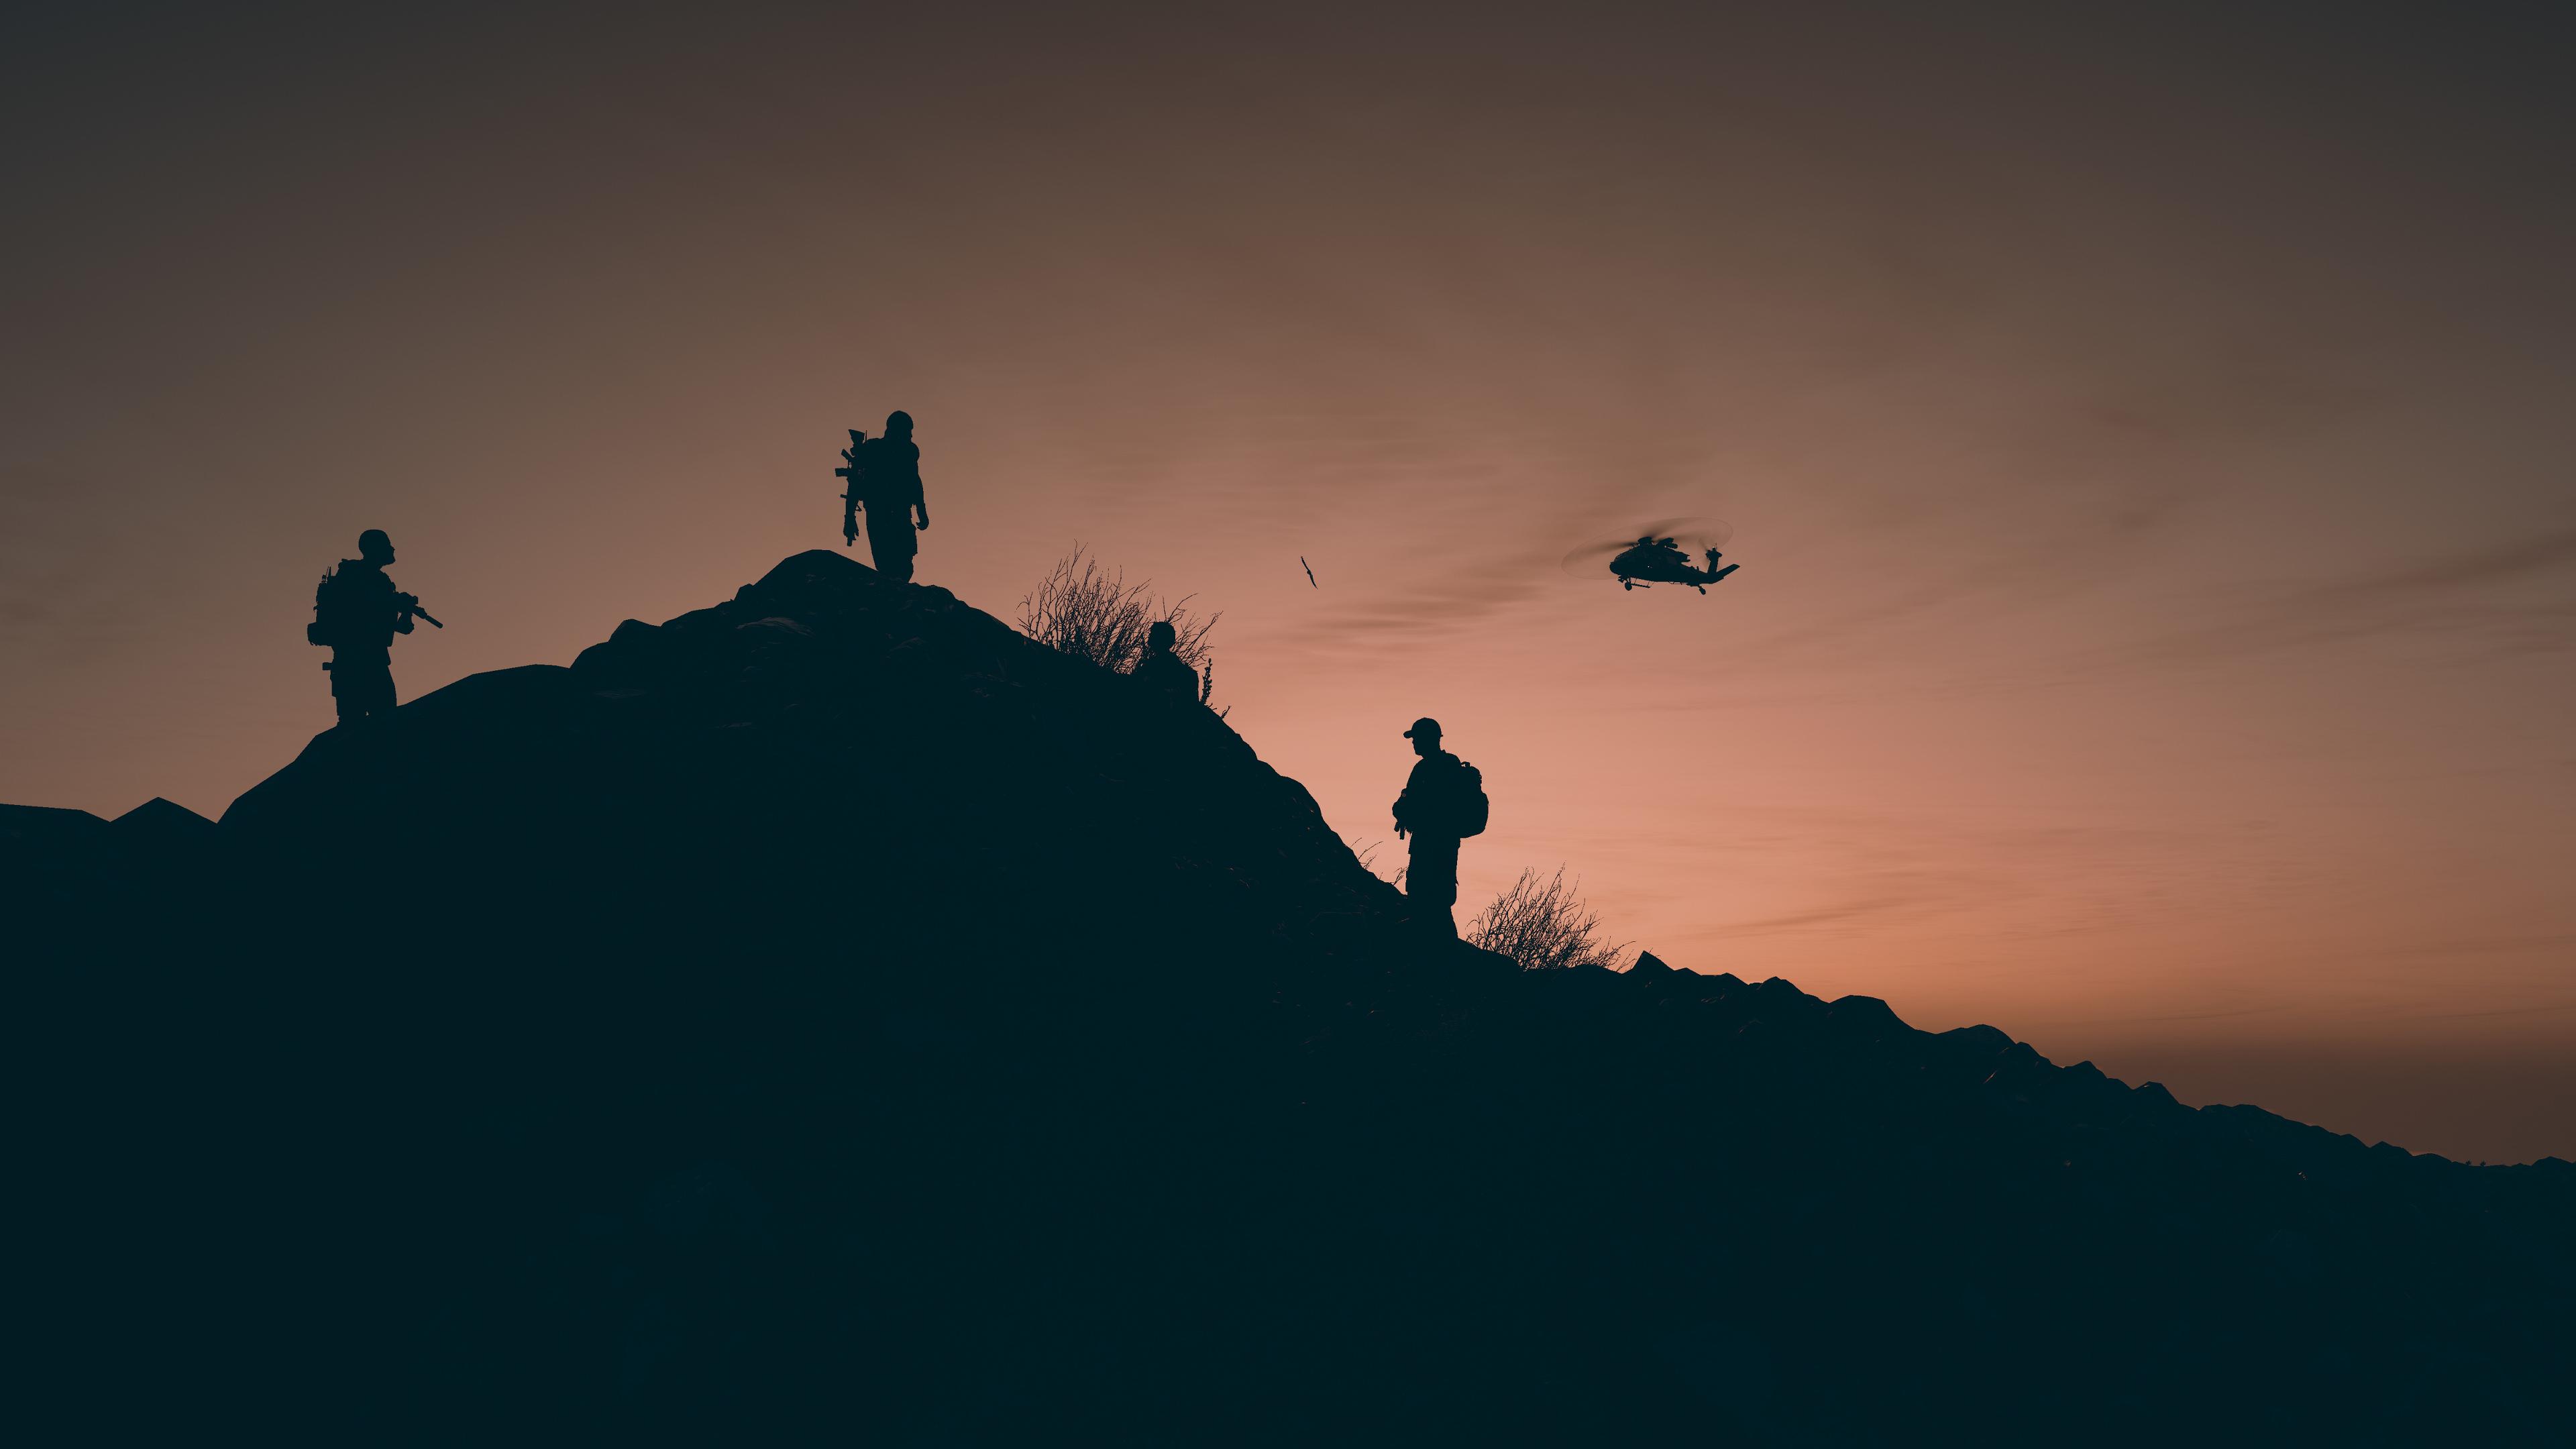 Wallpaper 4k Tom Clancys Ghost Recon Wildlands 2019 4k 2019 Games